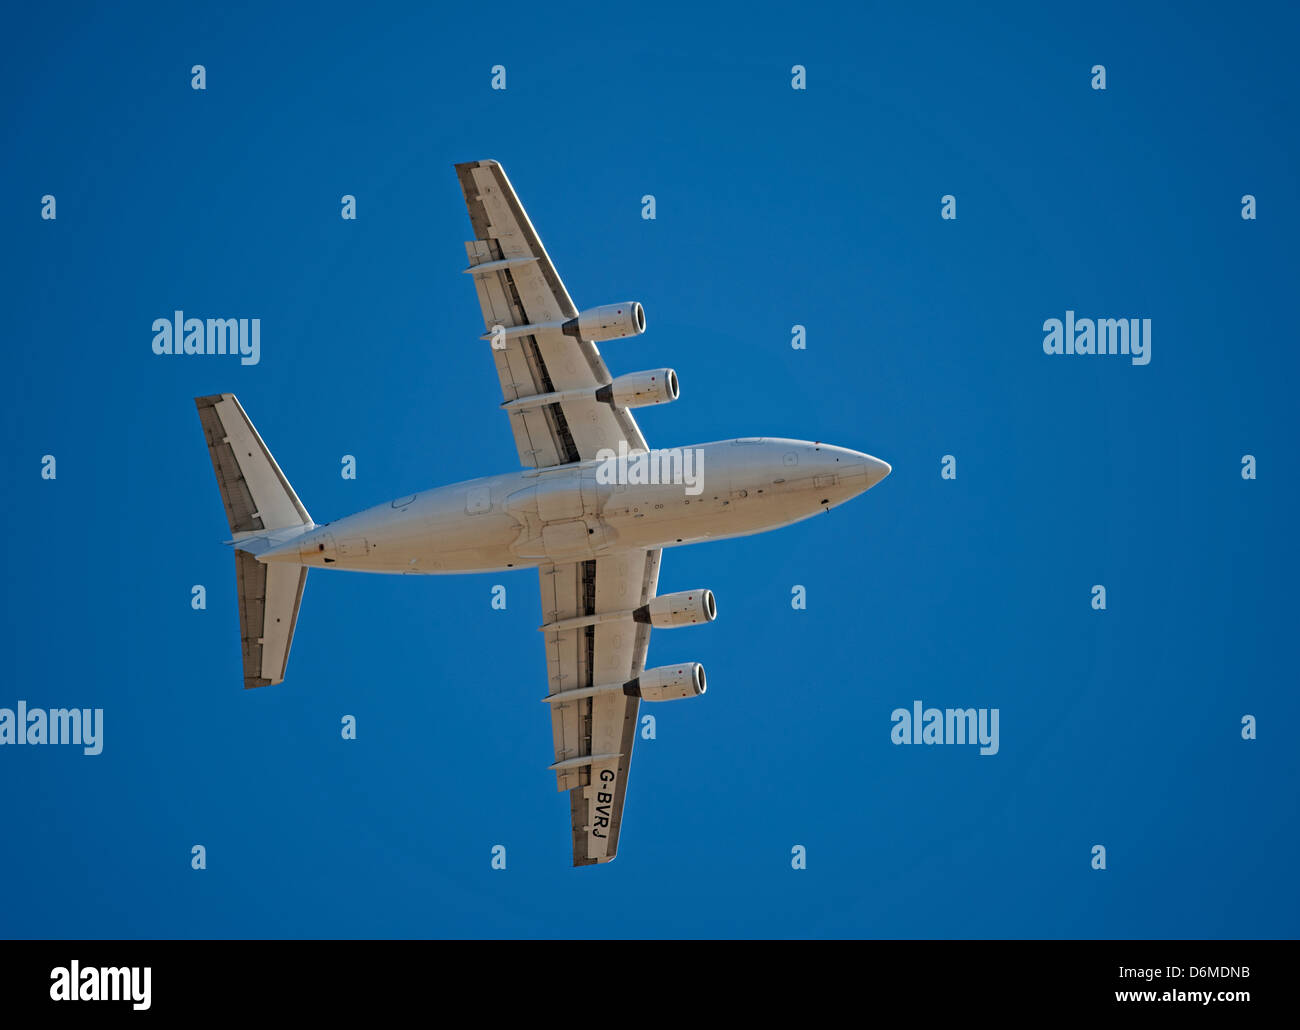 G-BVRJ QinetiQ British Aerospace Avro RJ70.  SCO 8999 - Stock Image